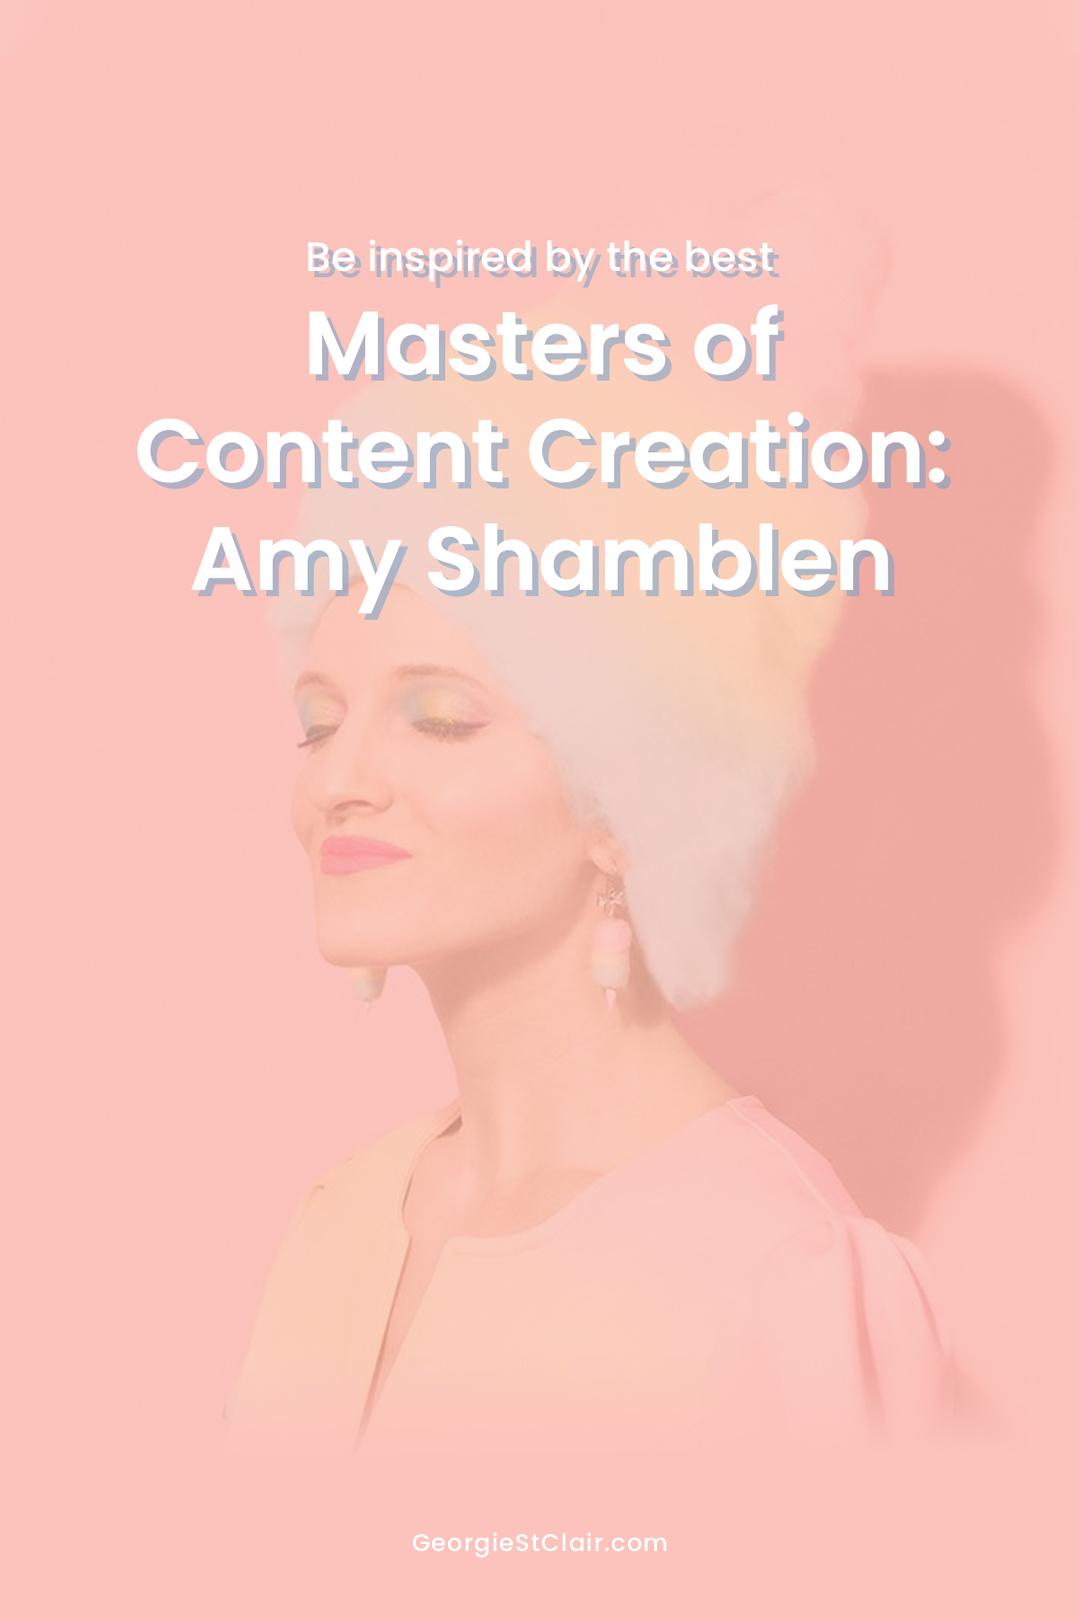 Amy-Shamblen-Pinterest2.jpgMasters of Instagram Content Creation: Amy Shamblen